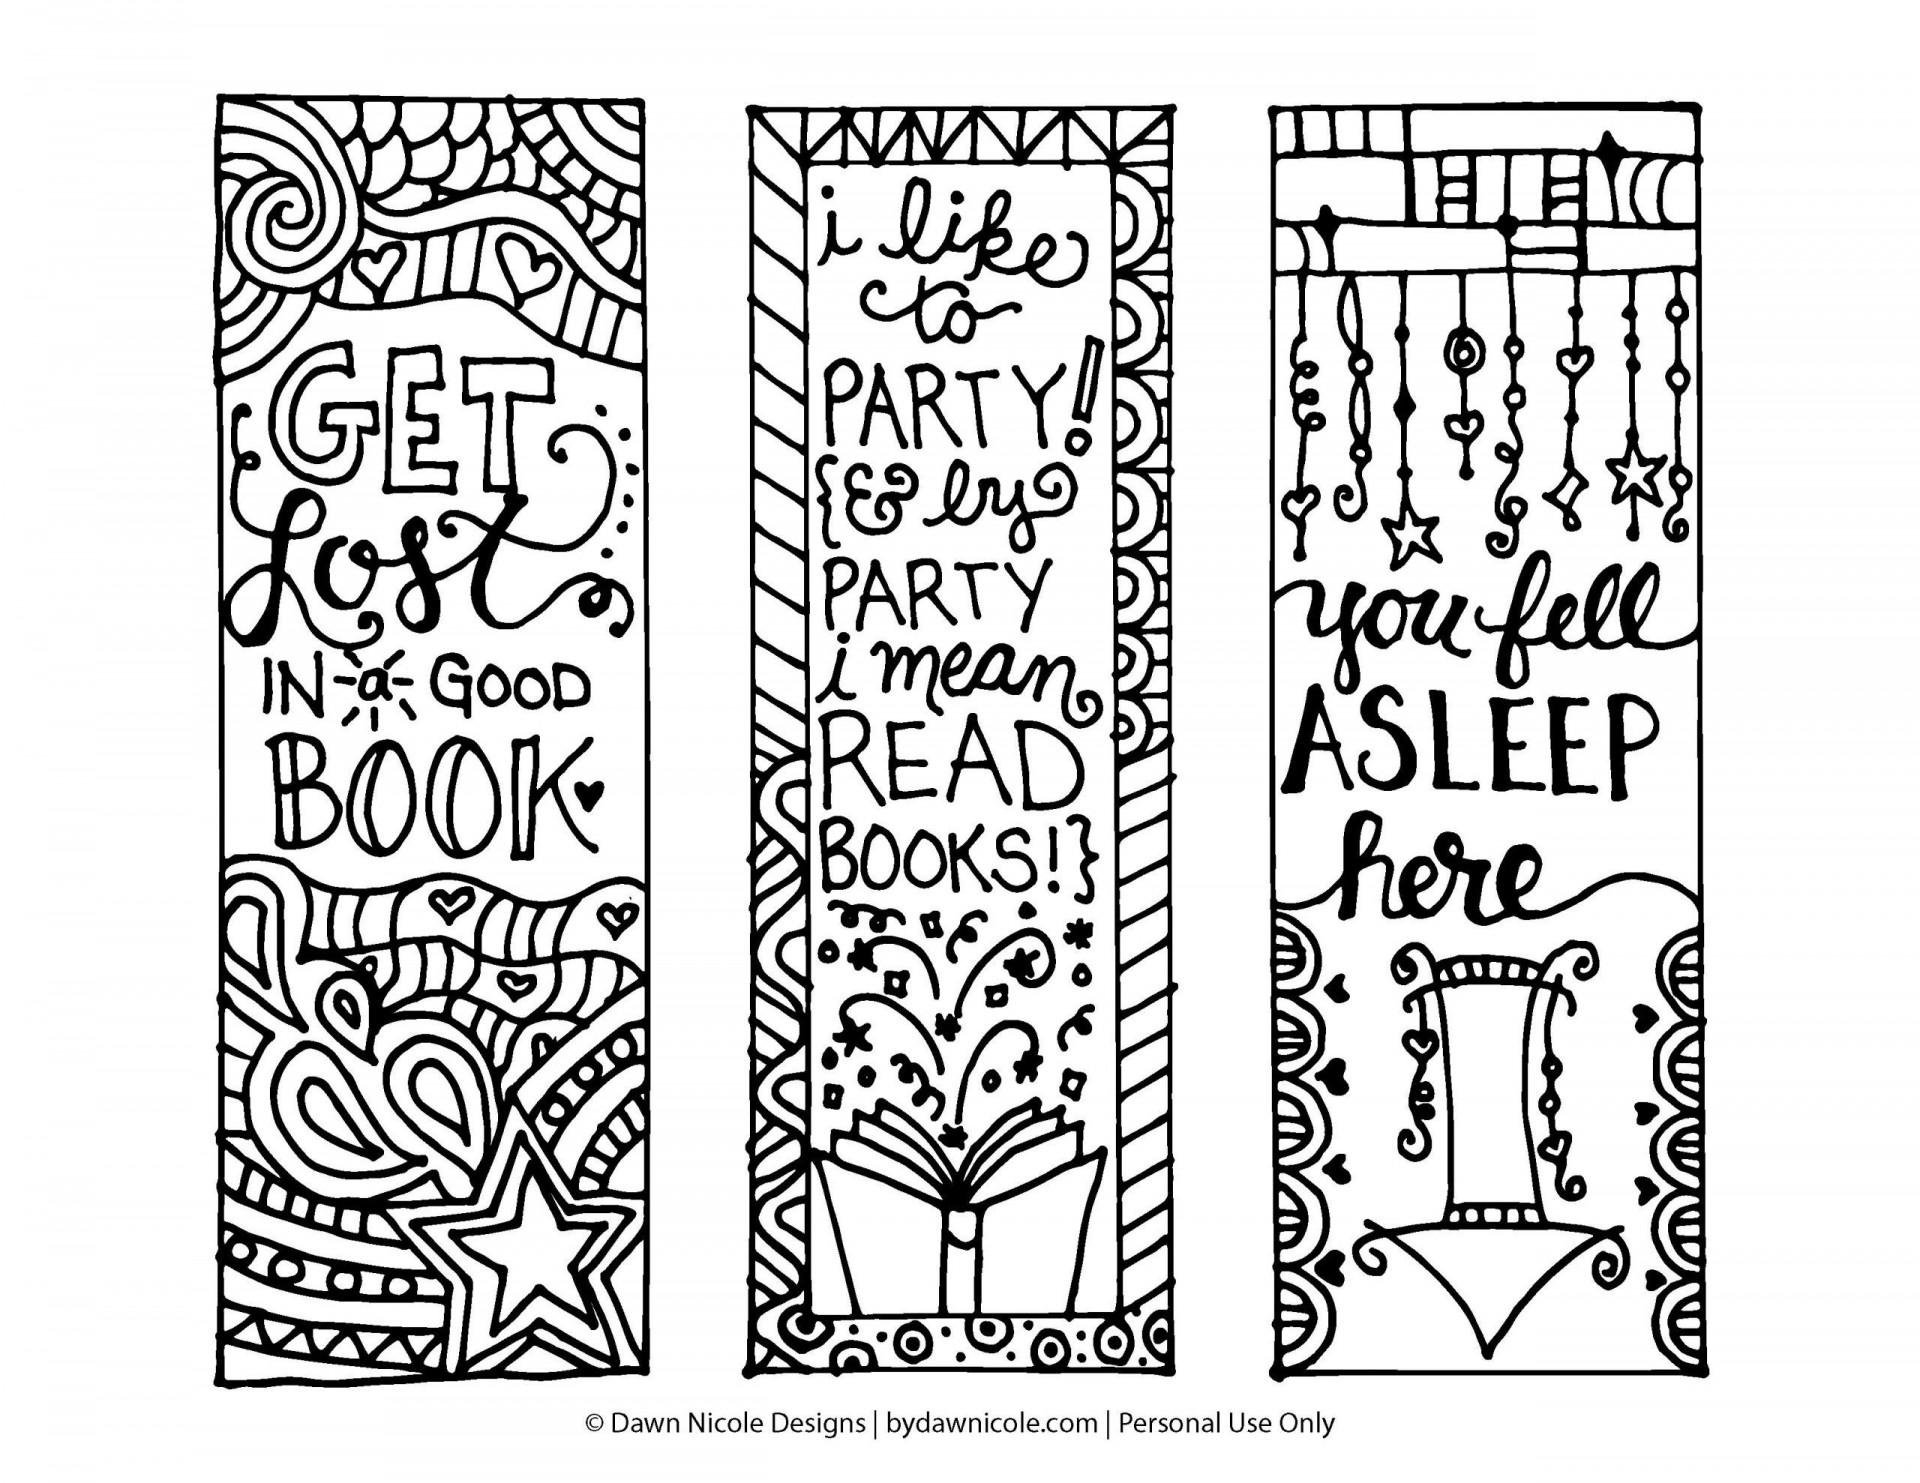 007 Sensational Free Printable Bookmark Template Example  Templates Download Photo For Teacher1920